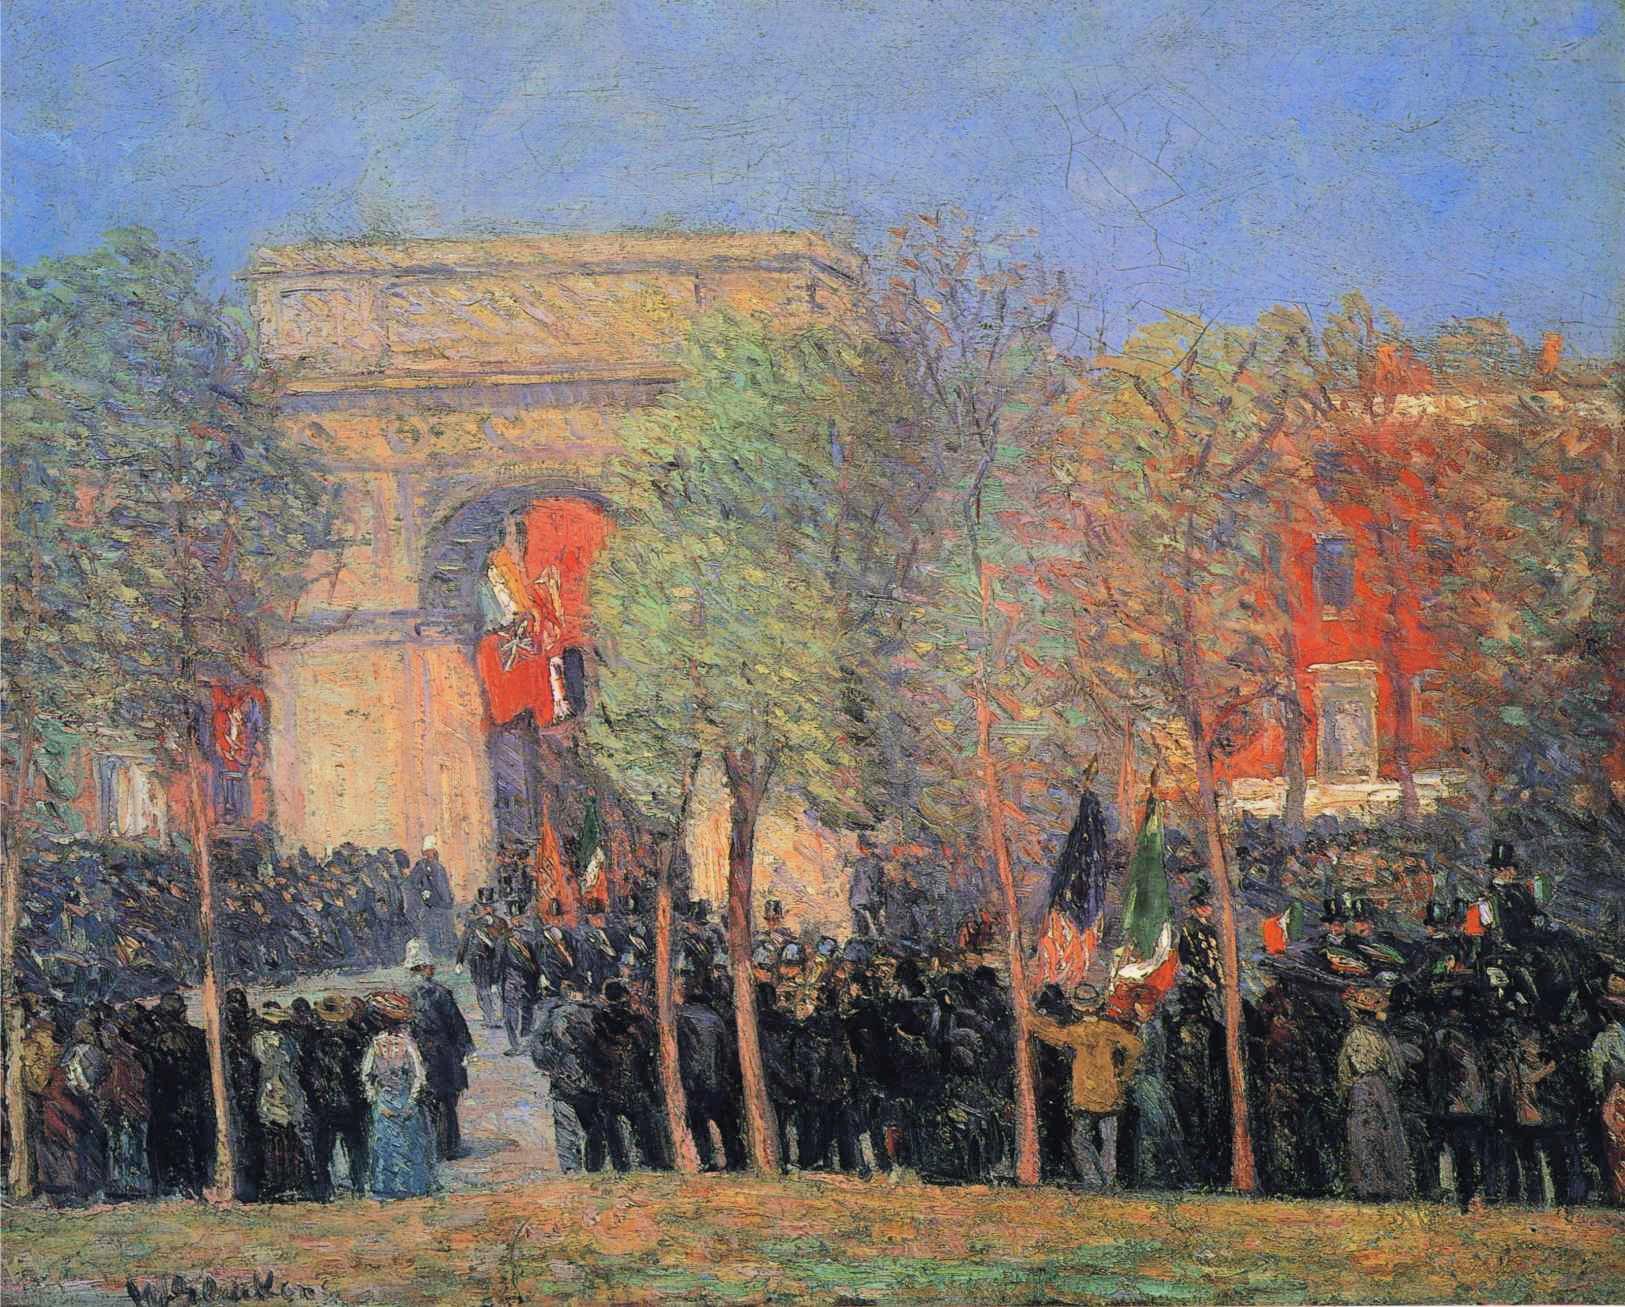 Italo-American Celebration, Washington Square 1912